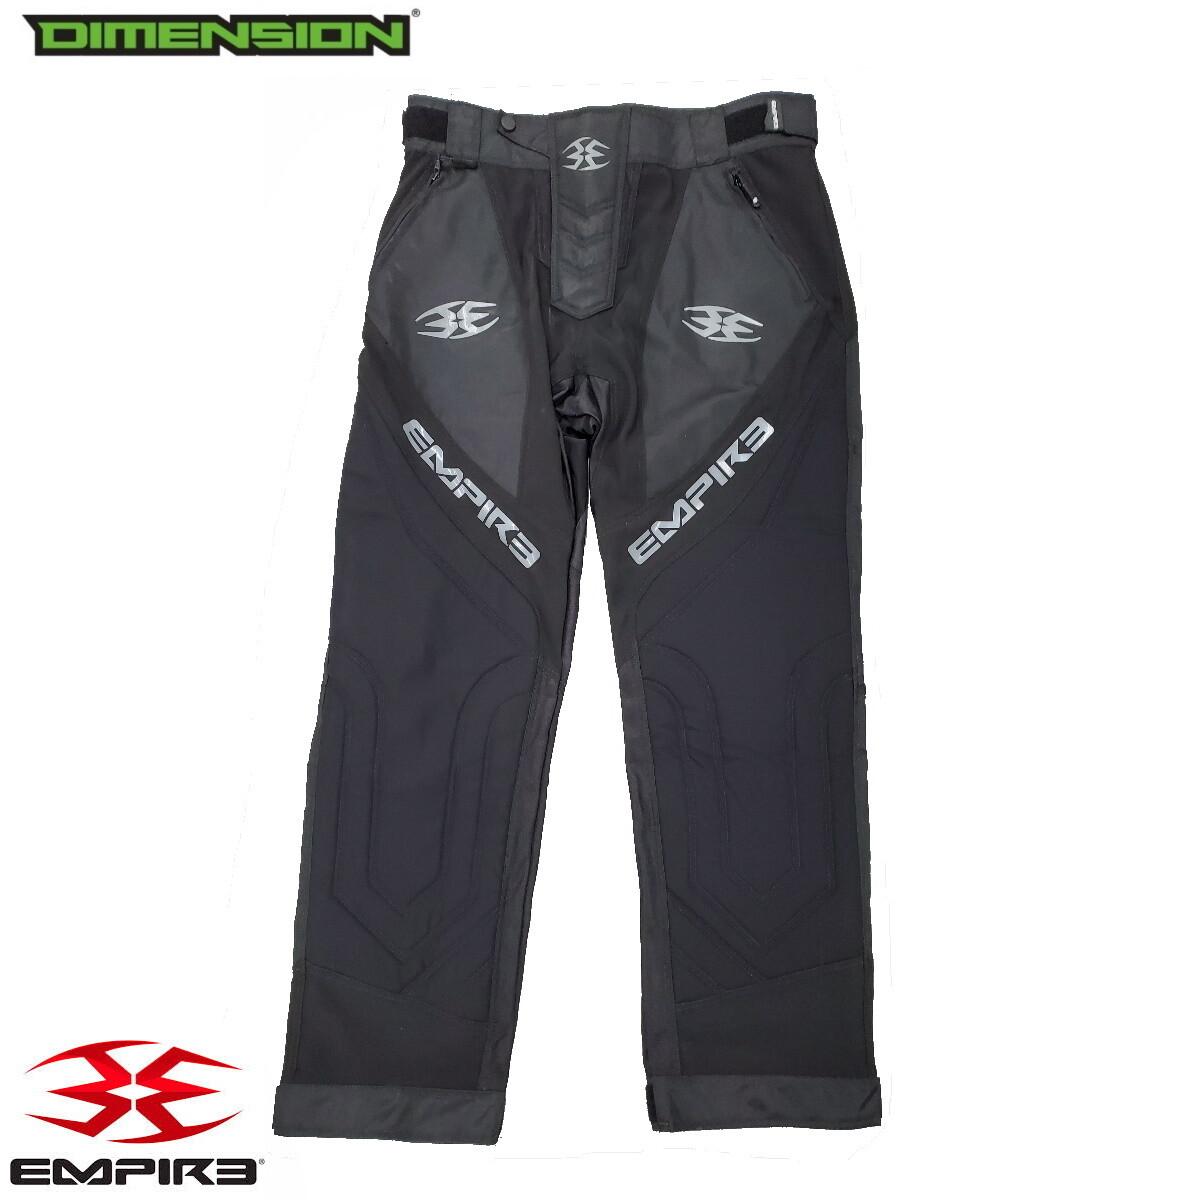 Empire Pants - Black - Medium